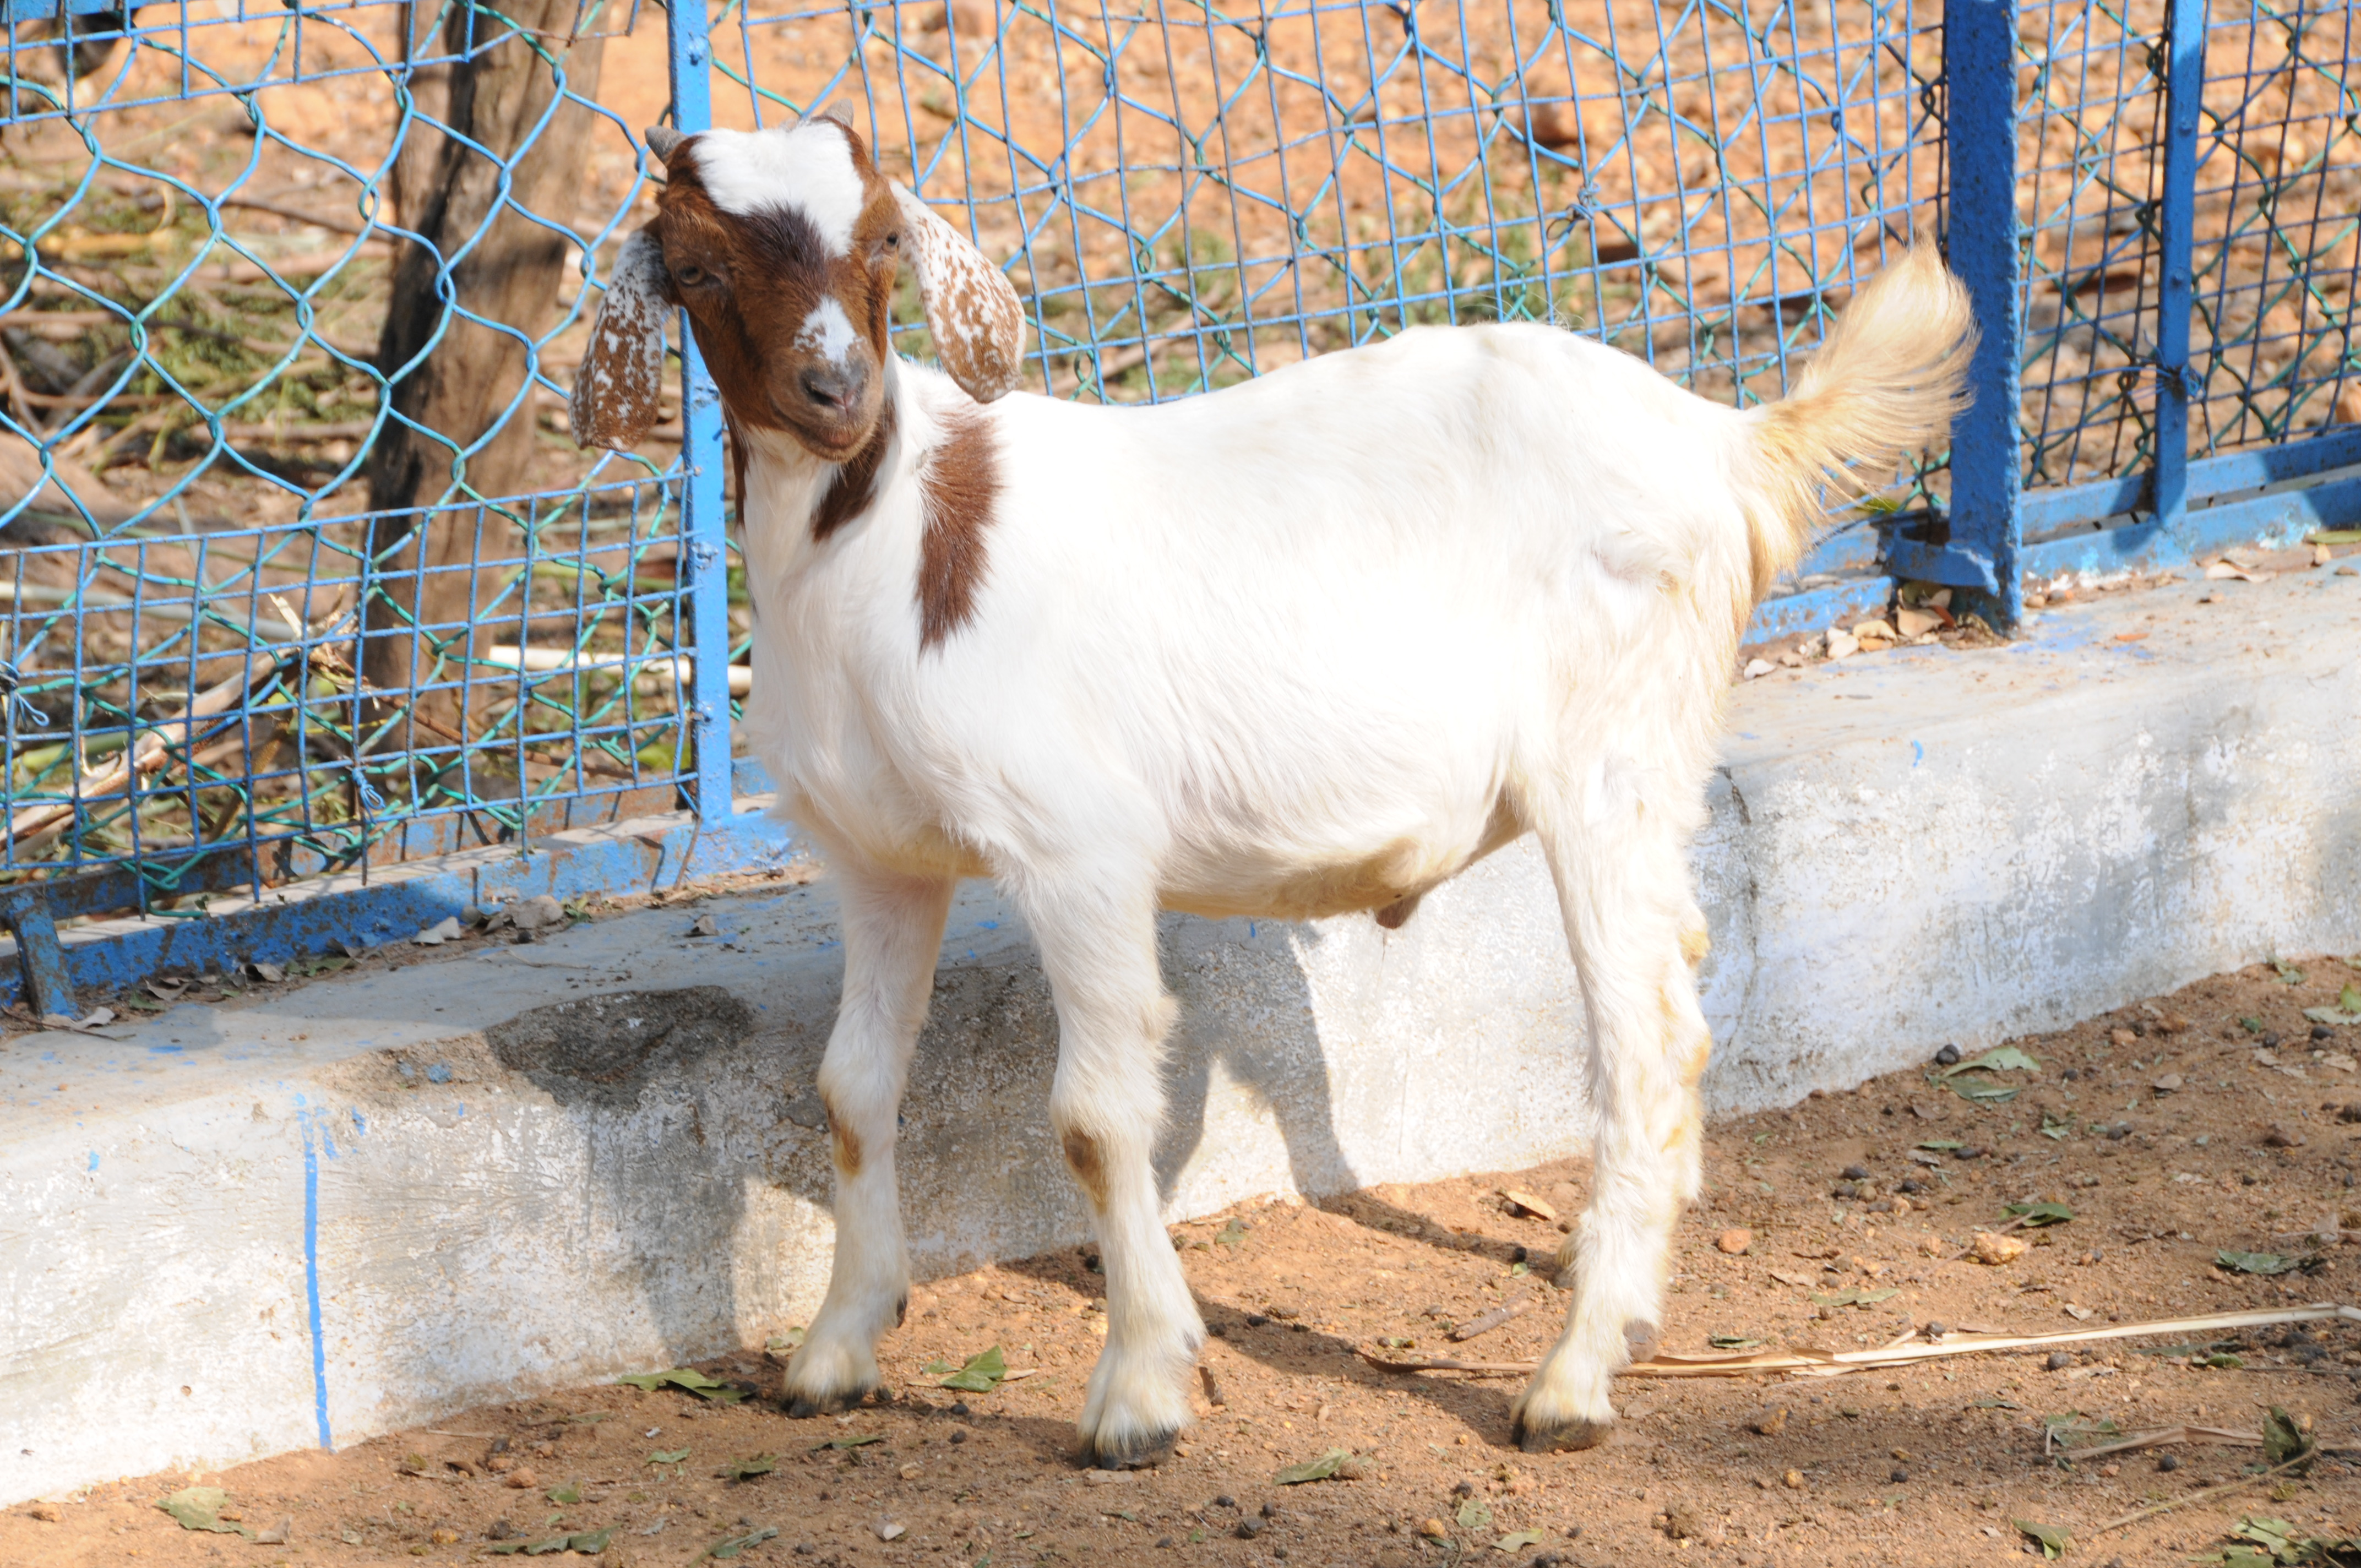 e99b240c7f1 Housing of sheep and goats